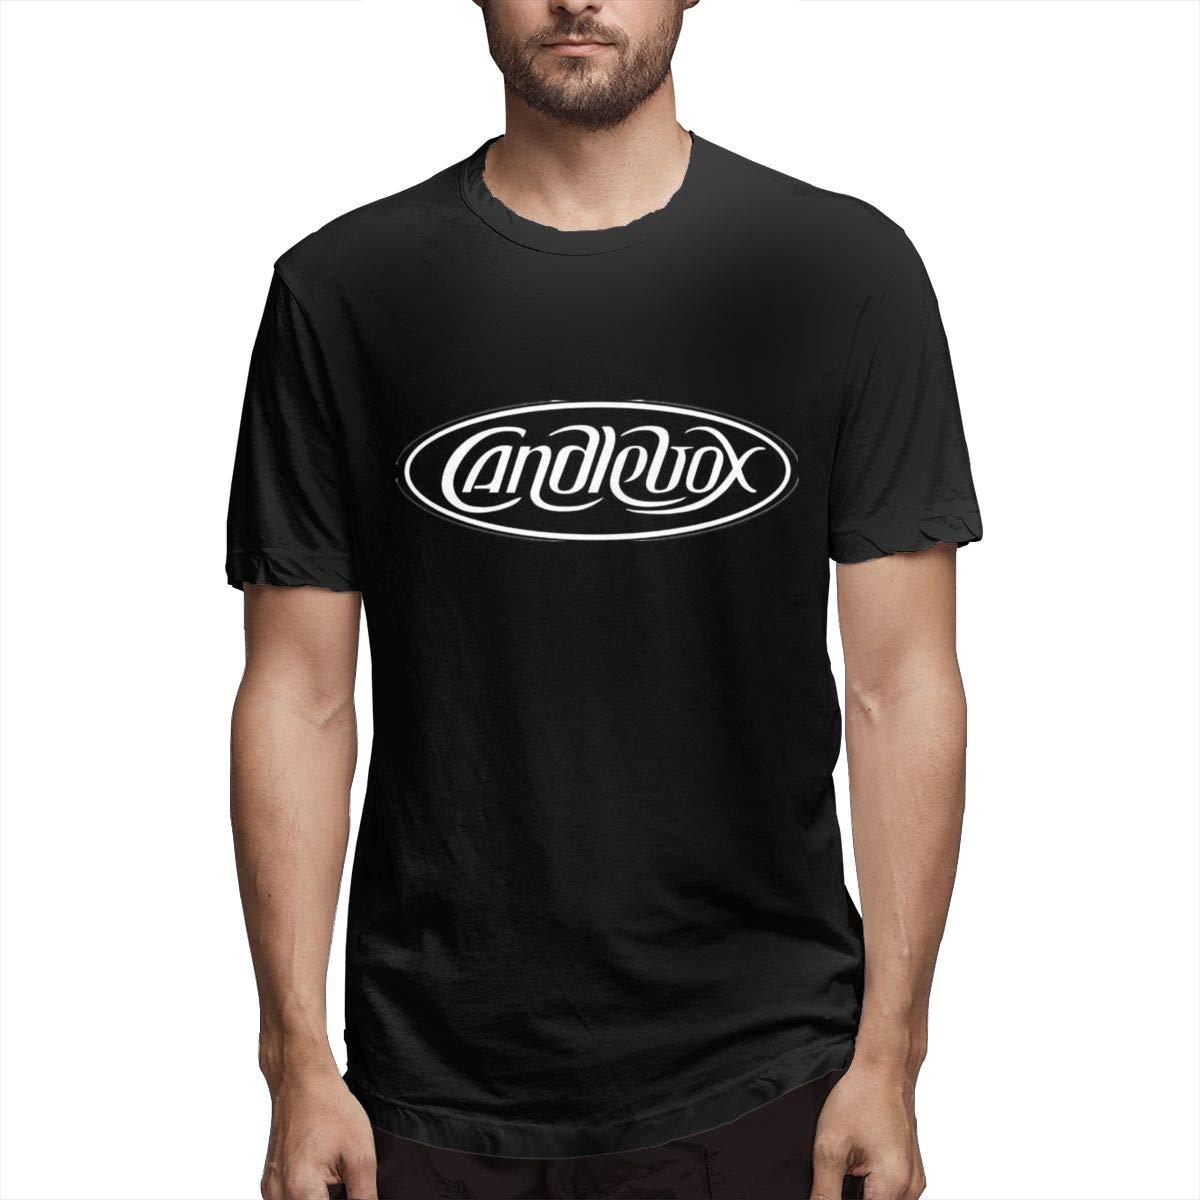 Lihehen Mans Candlebox Logo Retro Printing Round Neck Ts Shirts